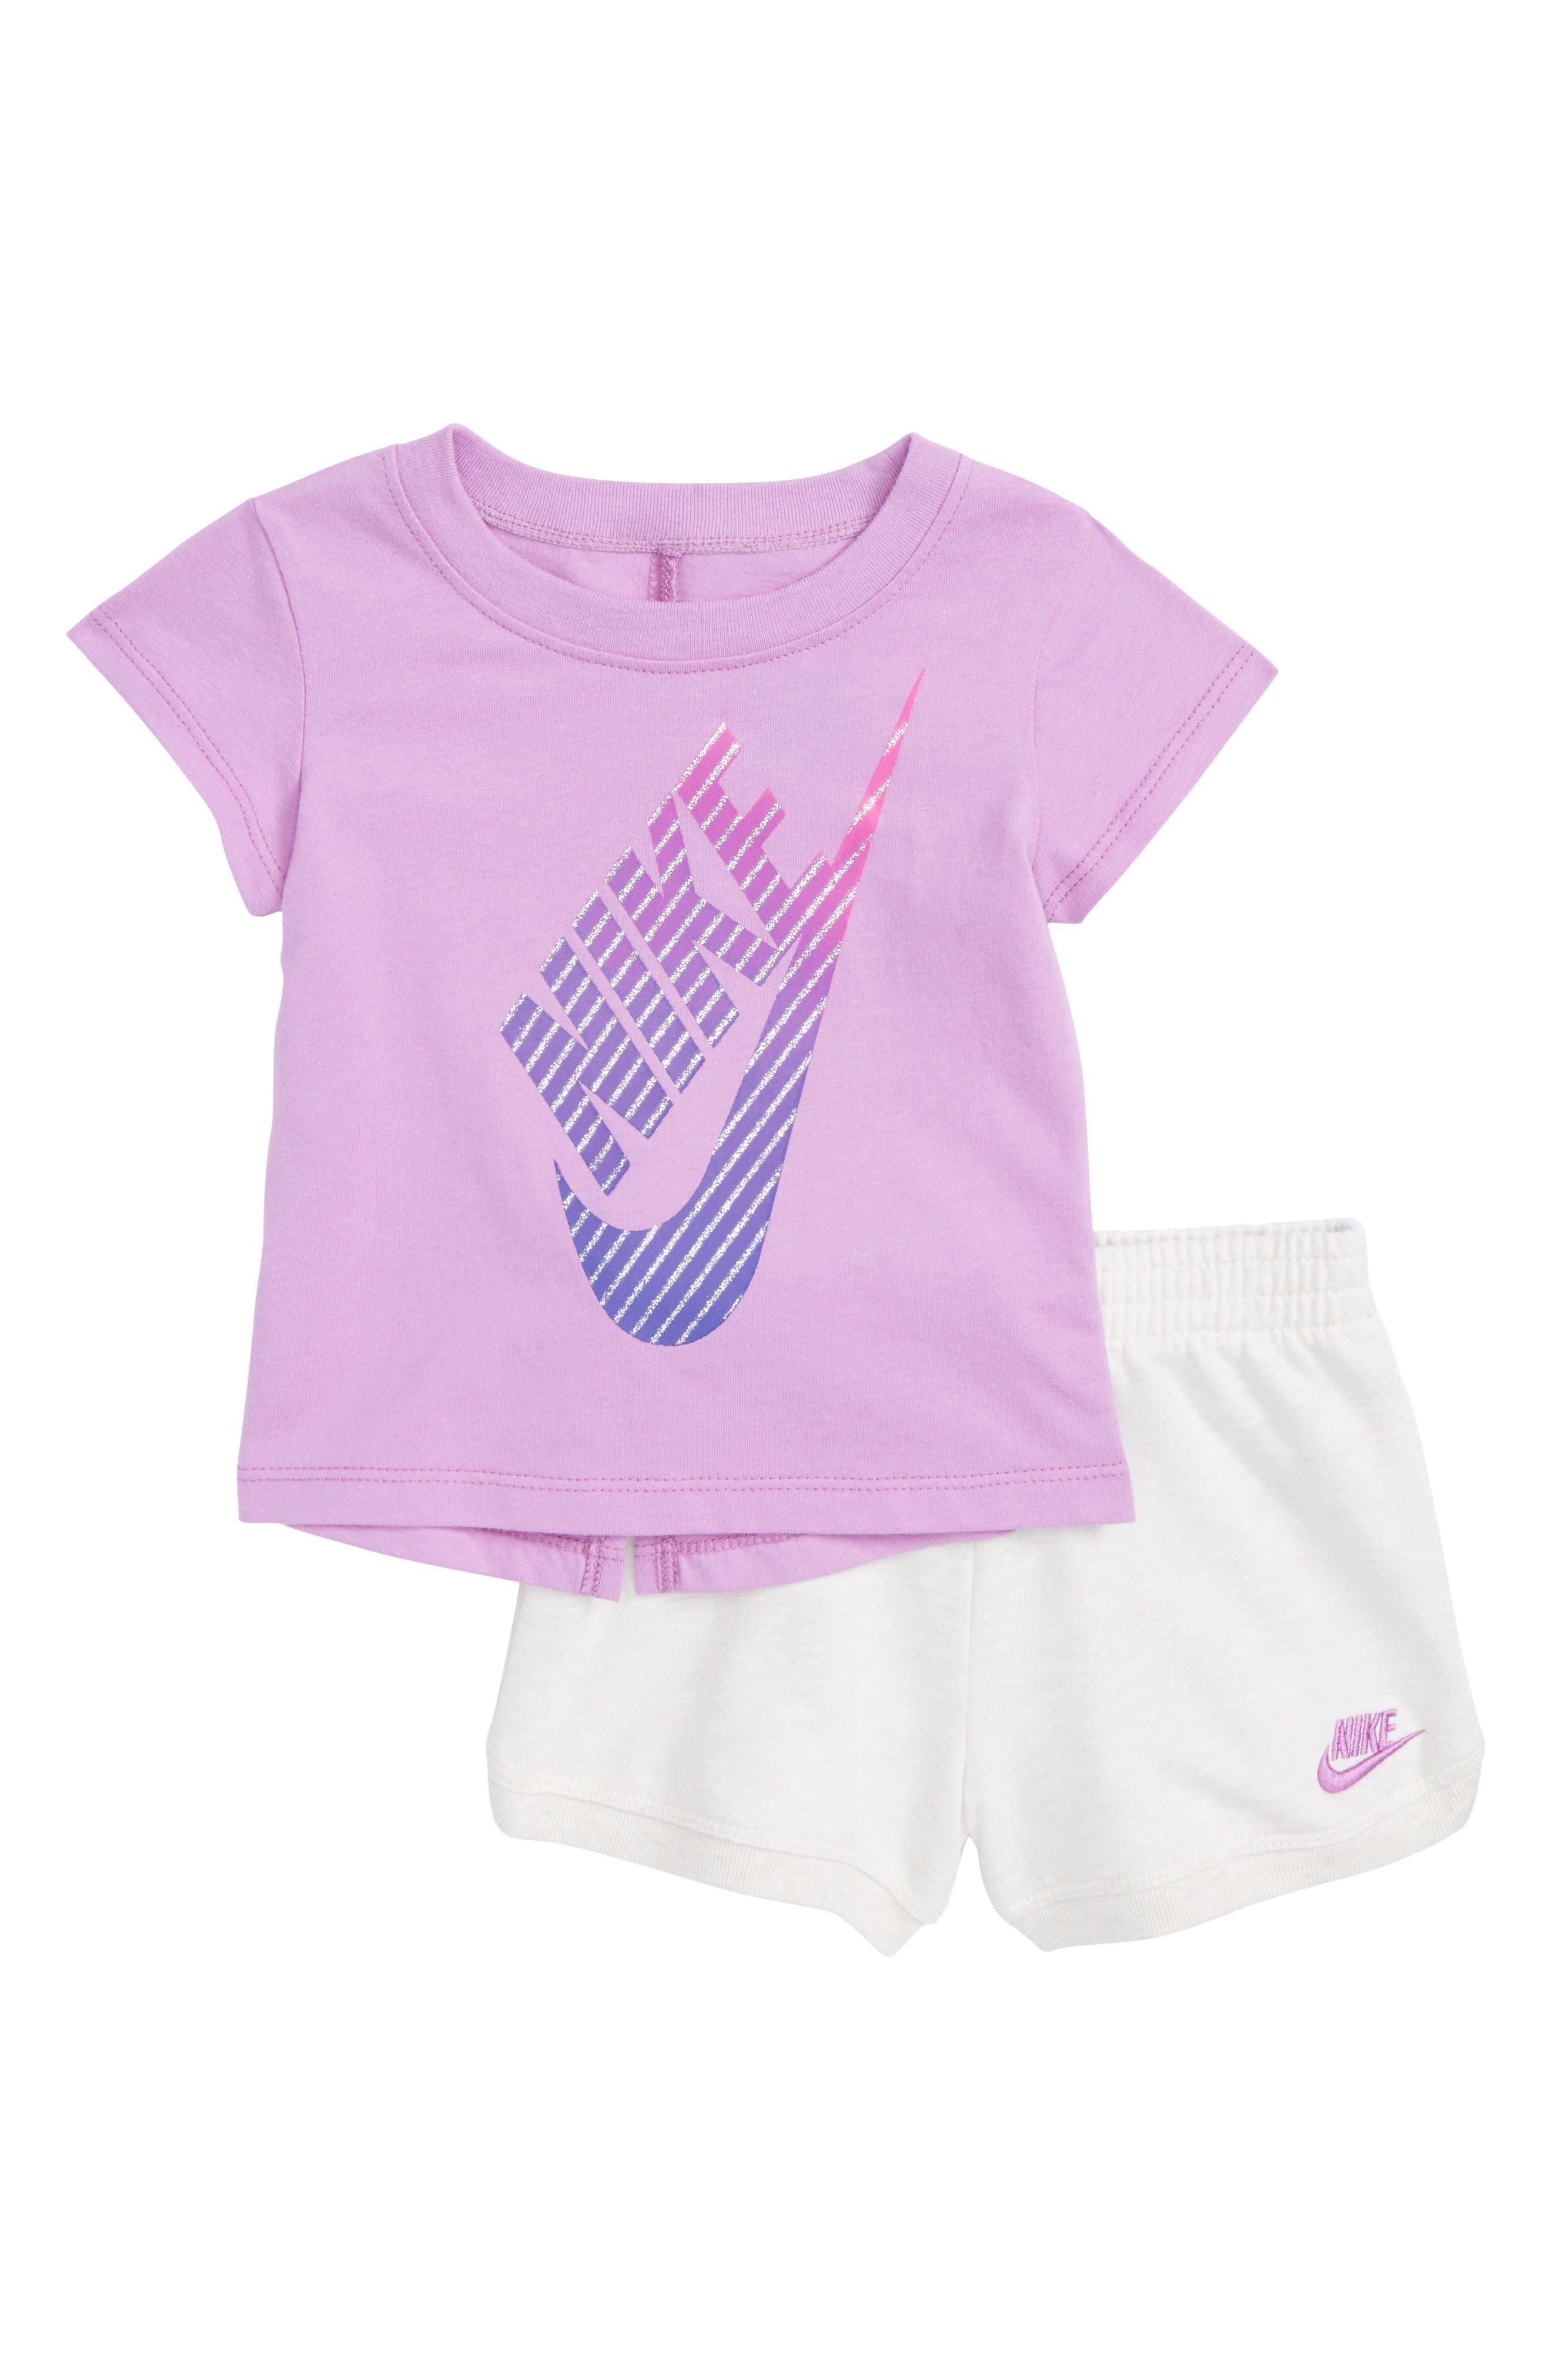 Main Image - Nike Gradient Futura Tee & Shorts Set (Baby Girls)